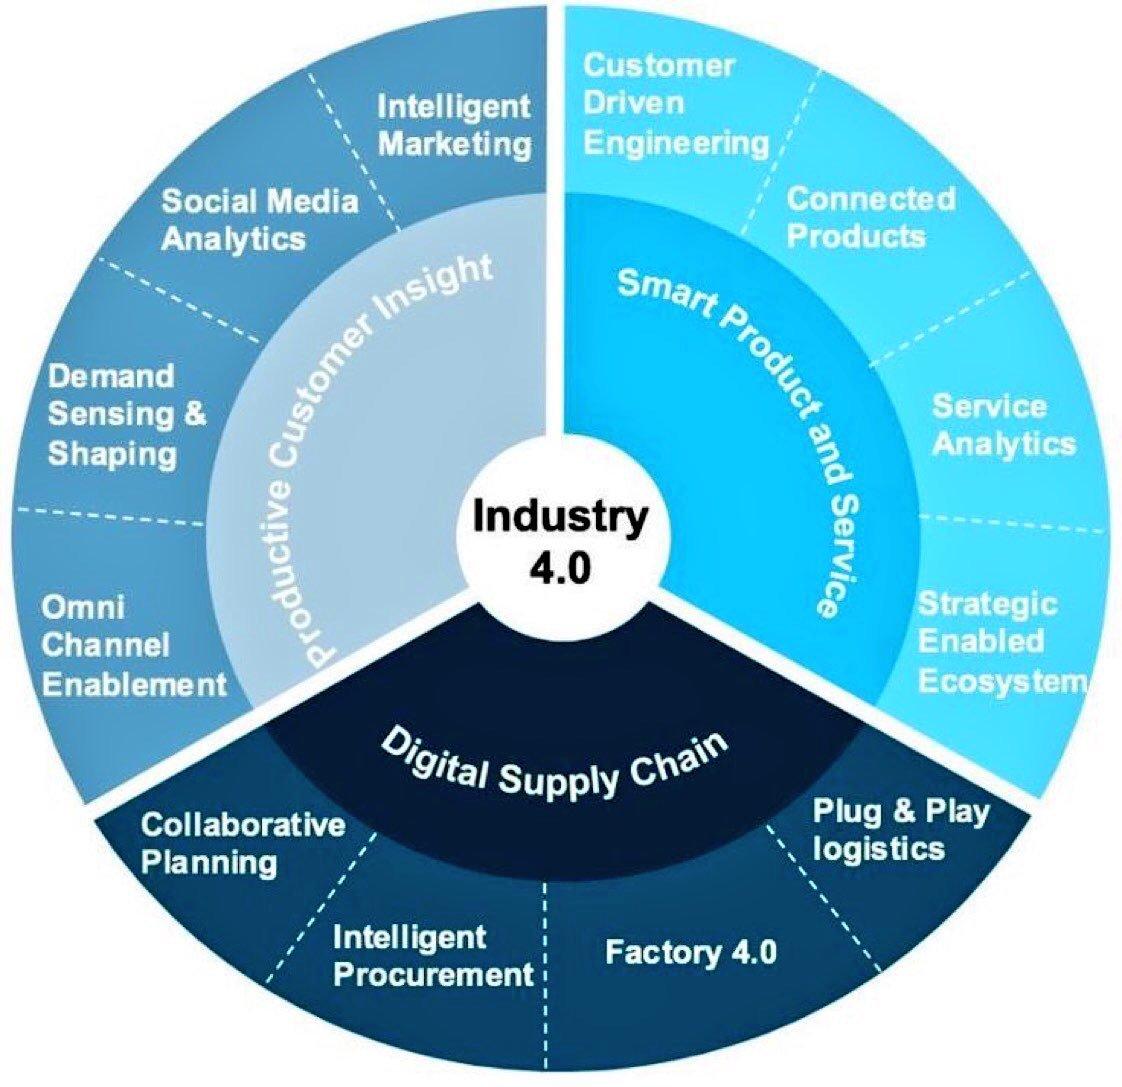 [ #Industry40 ] • Industry40 in a chart • #infographic   #CEO #CIO #CxO #IoT #IoE #IIoT #BigData #5G #3DP #Automation #AI #Robotics #DigitalTransformation #SEO  @BoschGlobal  @evankirstel @cloudpreacher<br>http://pic.twitter.com/6nozSl17pD